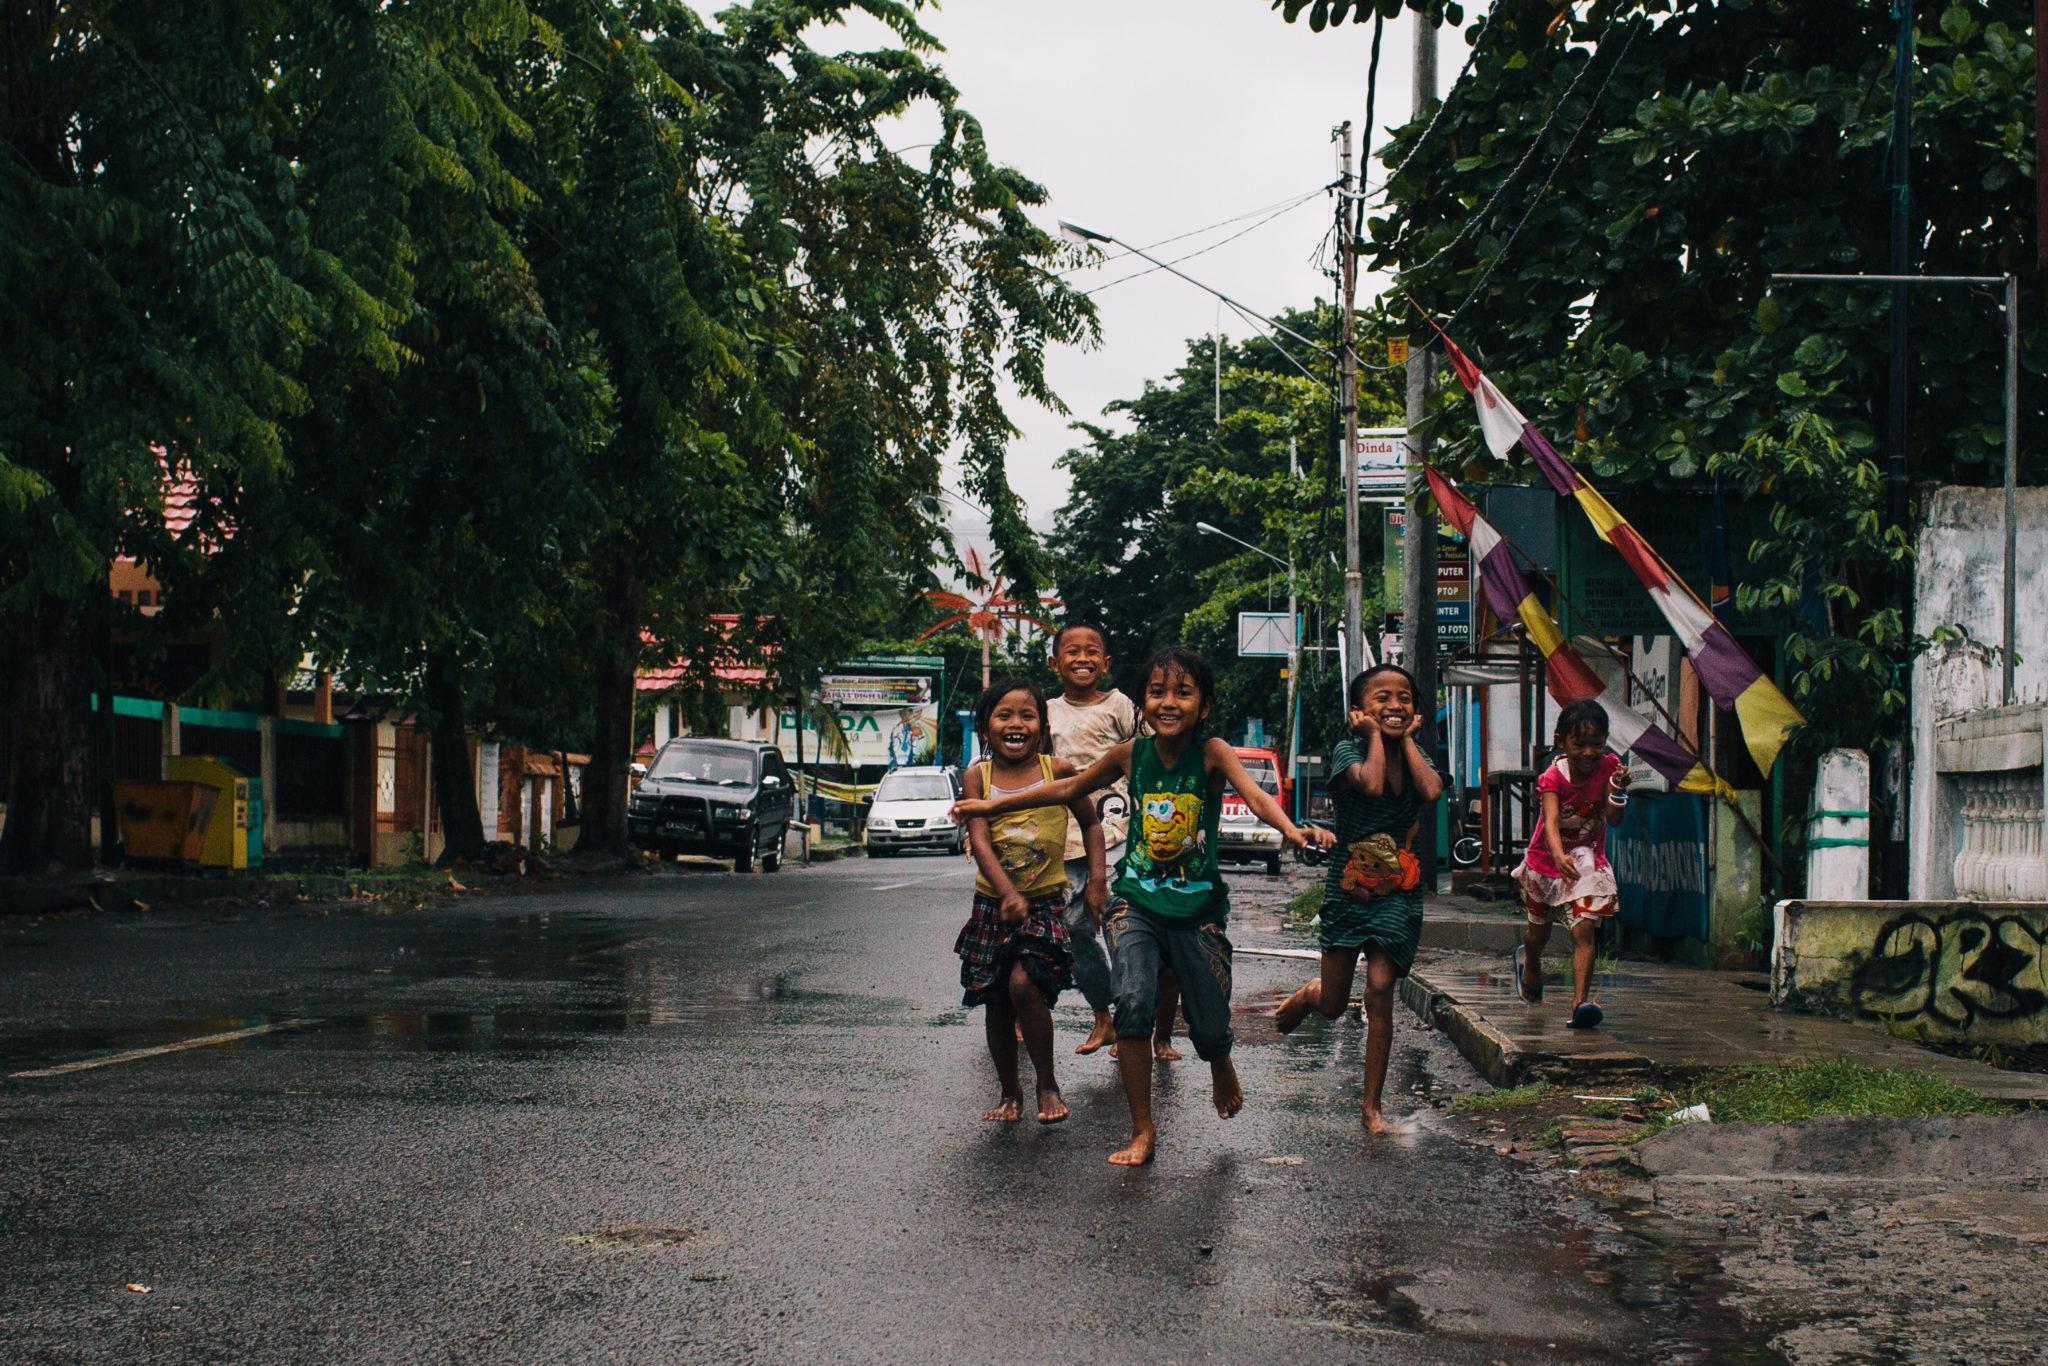 Sumbawa-Indonesien-Kinder